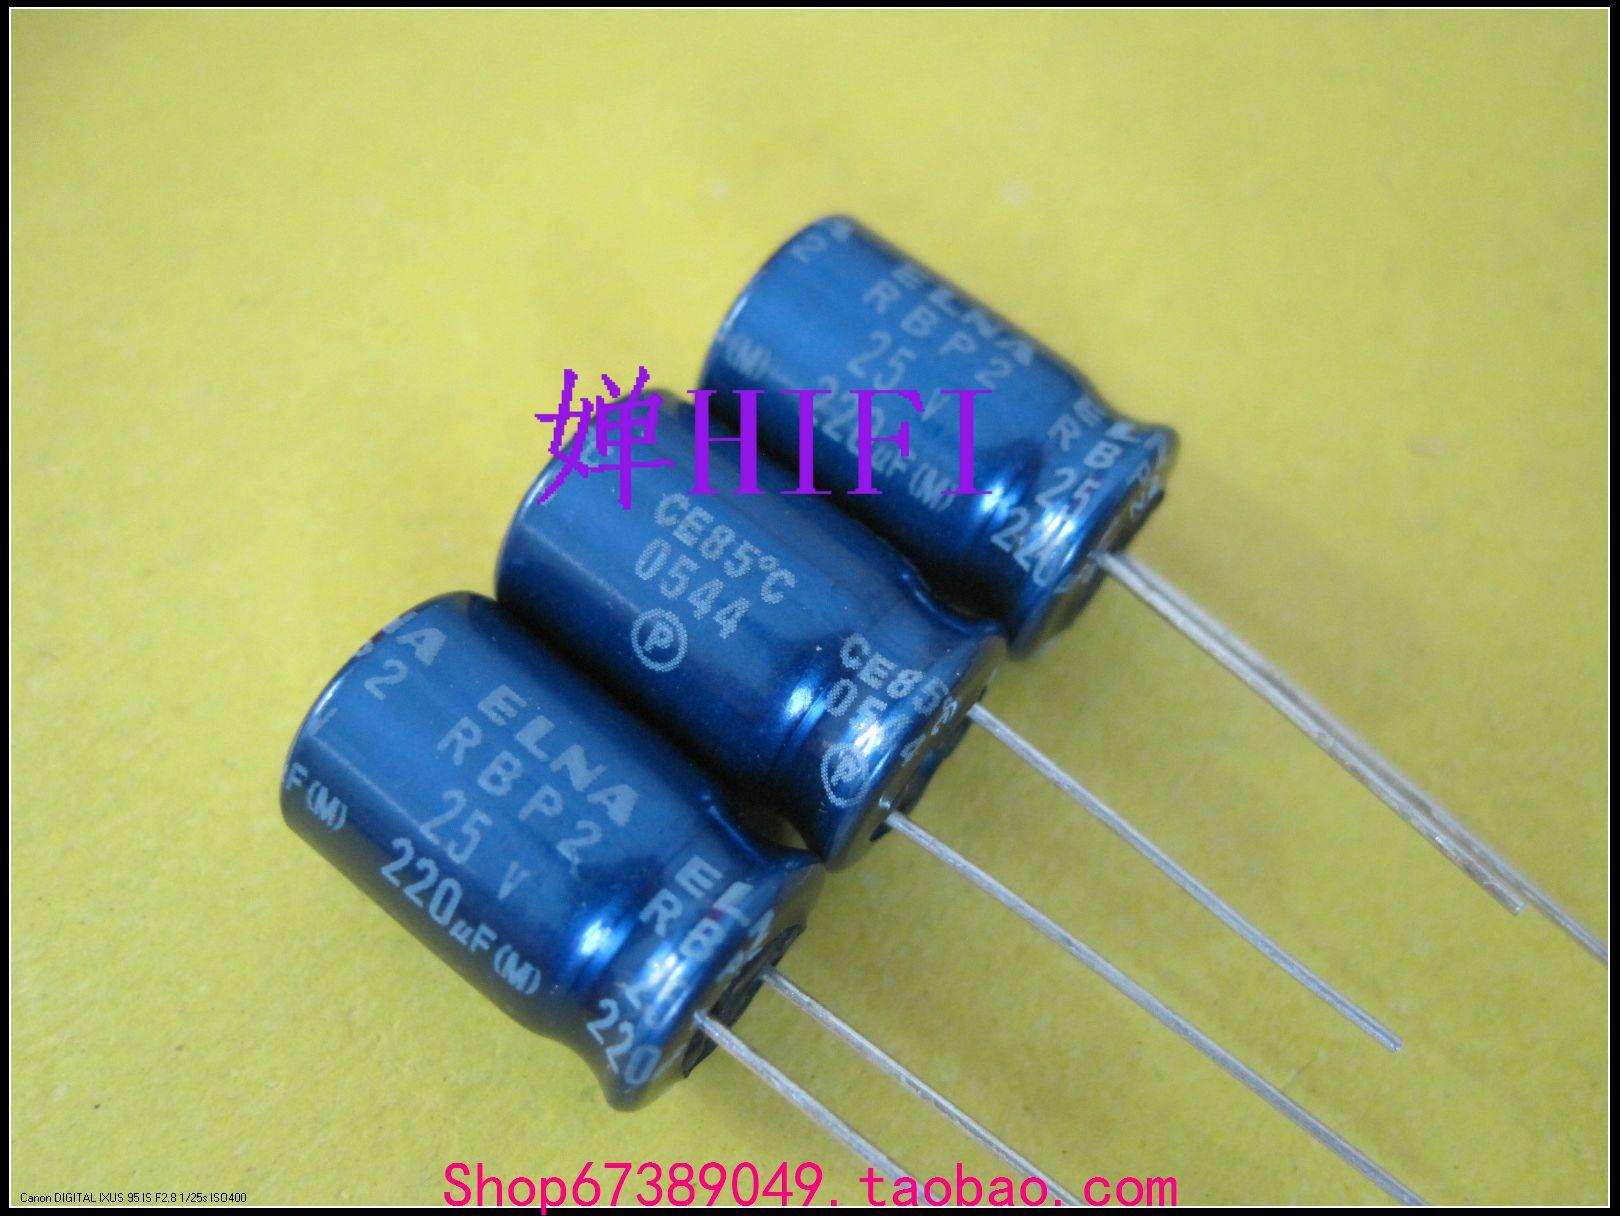 2020 gran oferta 20 piezas/50PCS ELNA original bata azul BP prometo condensador electrolítico 25v220uf 10x16mm envío gratis